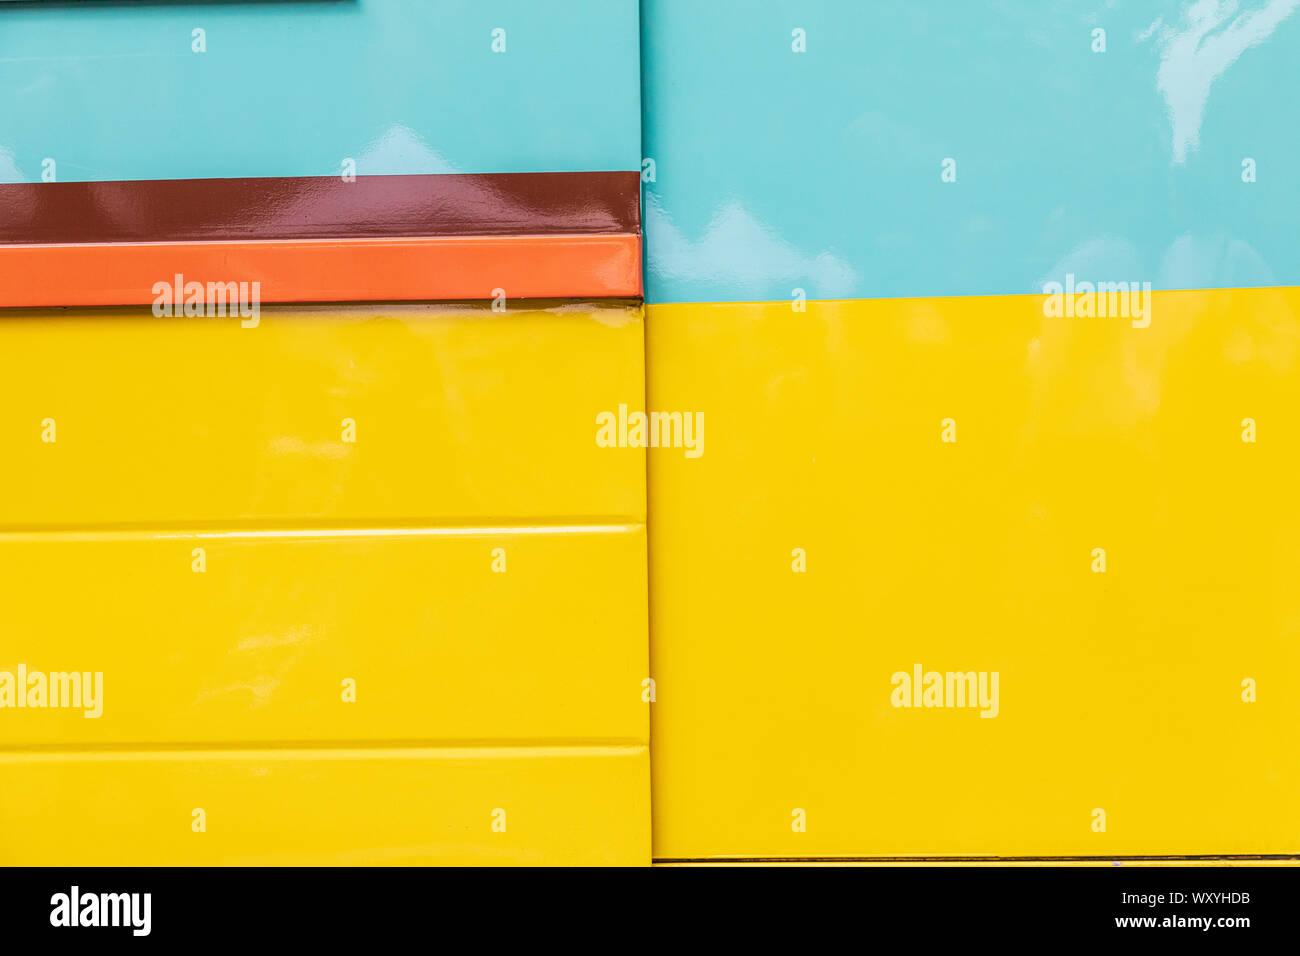 USA, Washington State, Vancouver. Colorful wall at a farmers market. Stock Photo